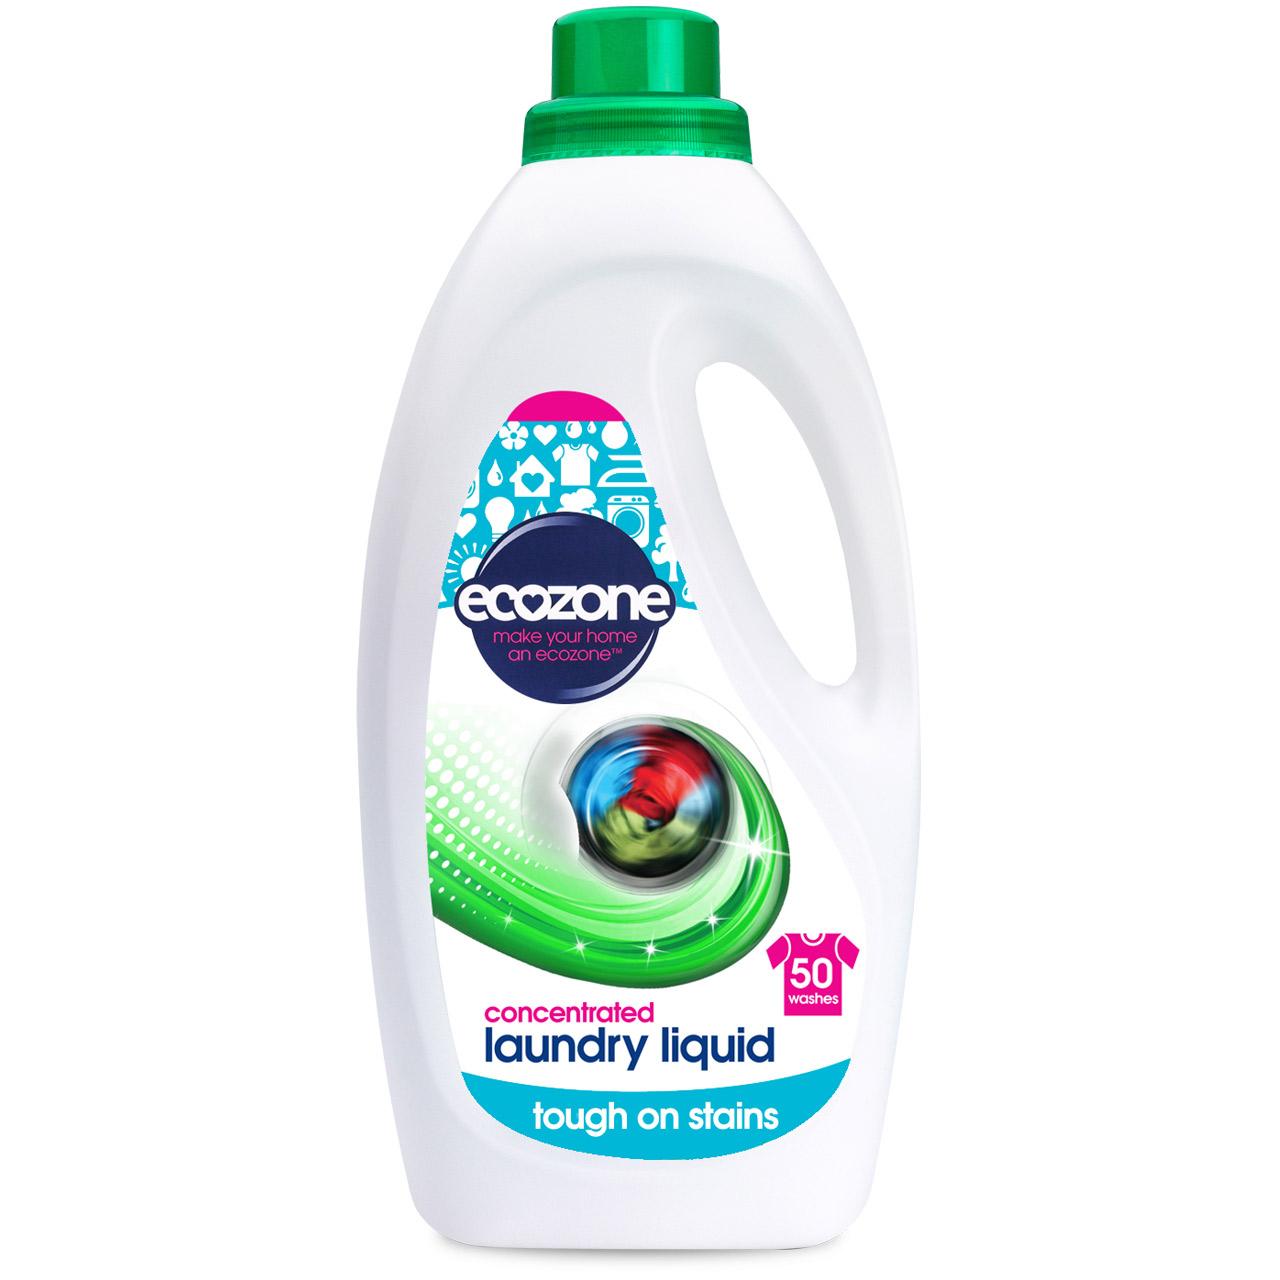 Ecozone Bio Concentrated Laundry Liquid - 2L - 50 Washes